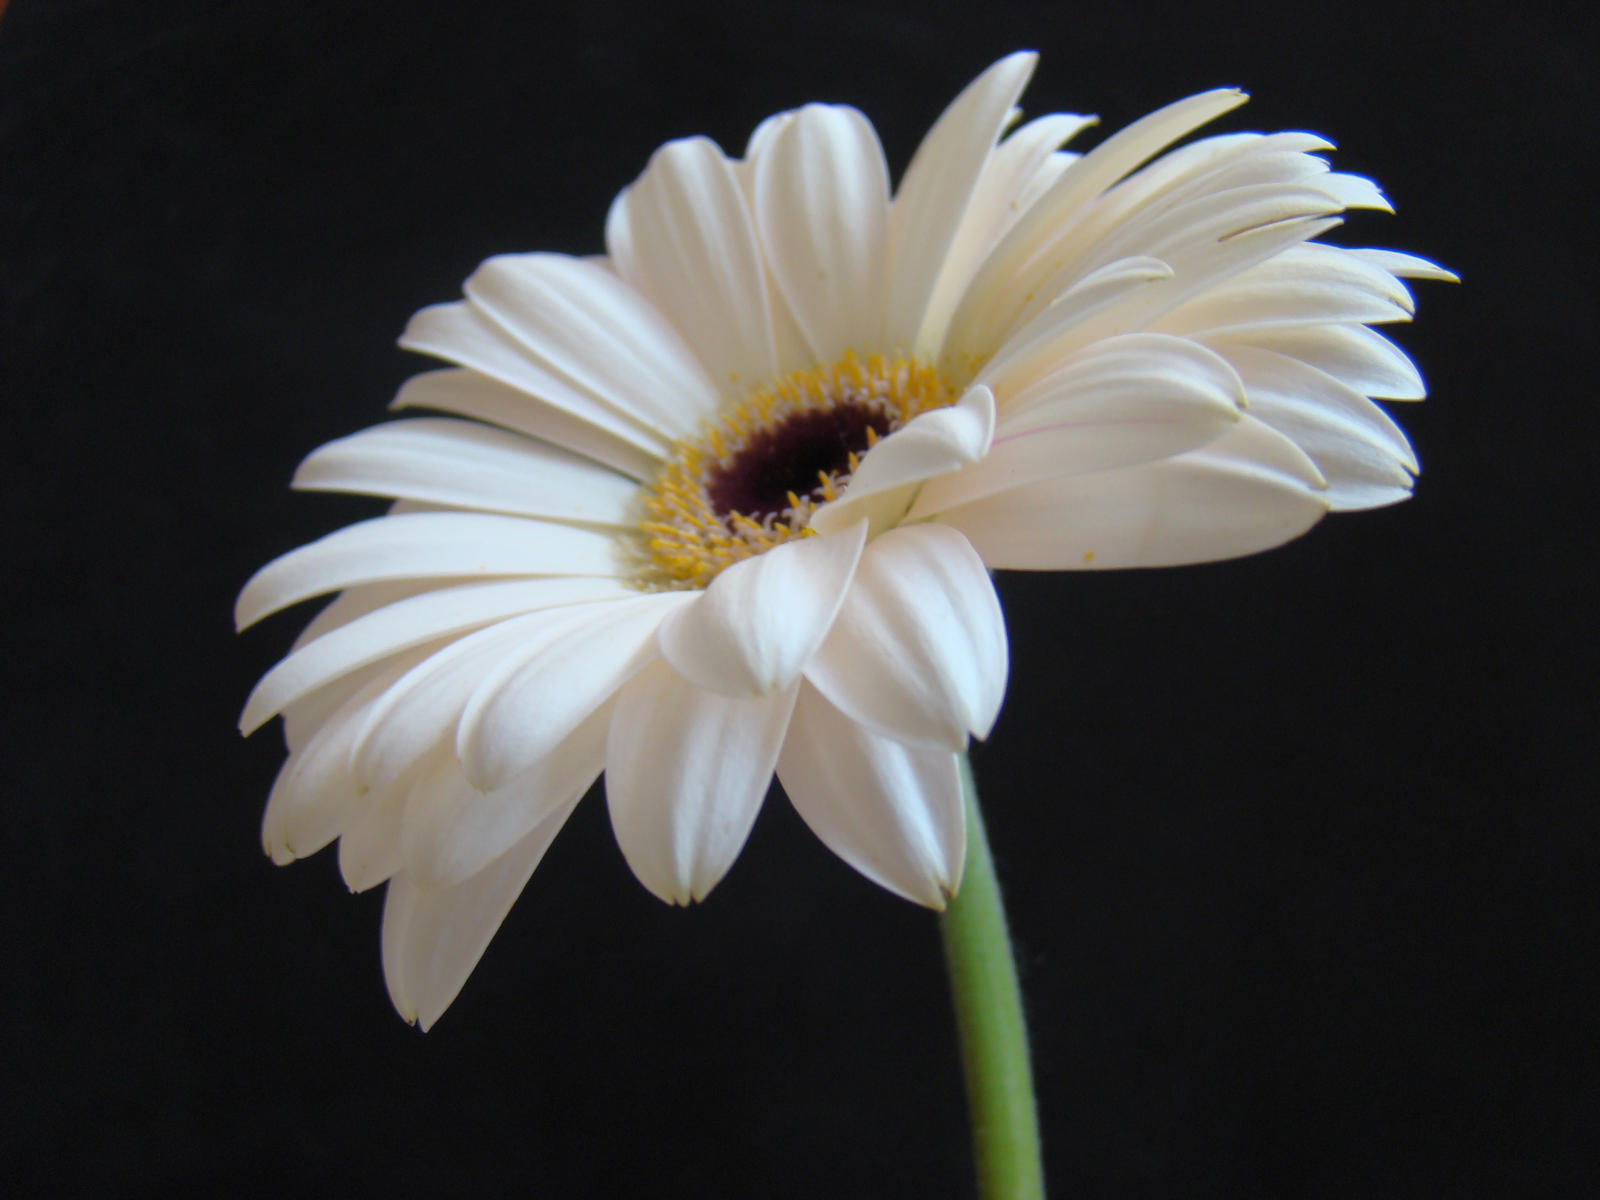 White gerber daisy by juice 04 on deviantart white gerber daisy by juice 04 mightylinksfo